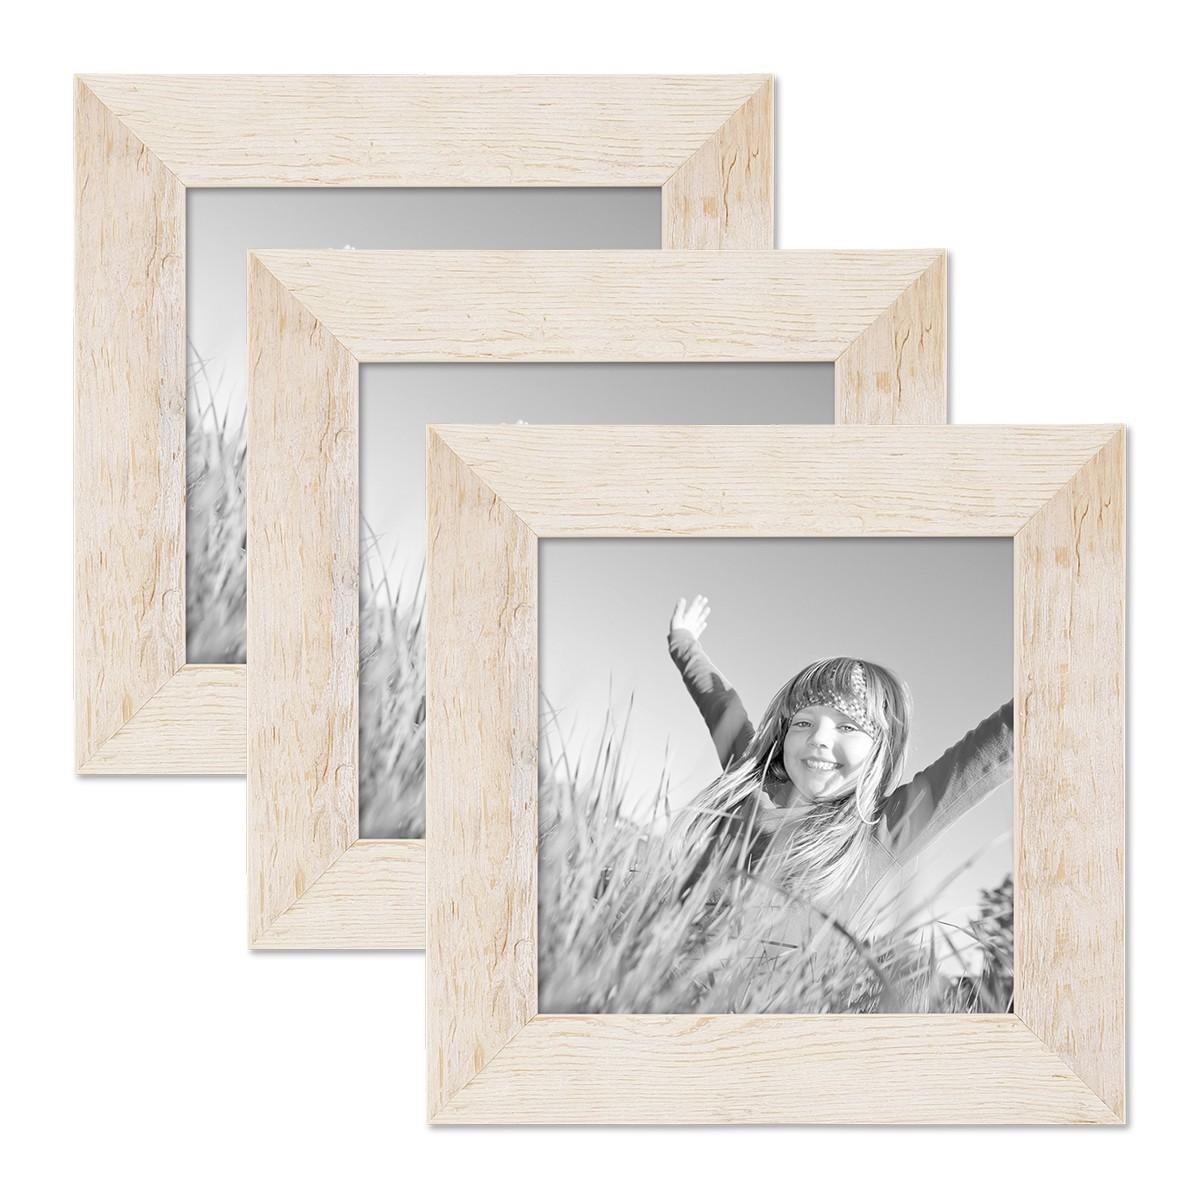 3er bilderrahmen set 15x15 cm strandhaus rustikal weiss massivholz mit glasscheibe inkl zubeh r. Black Bedroom Furniture Sets. Home Design Ideas